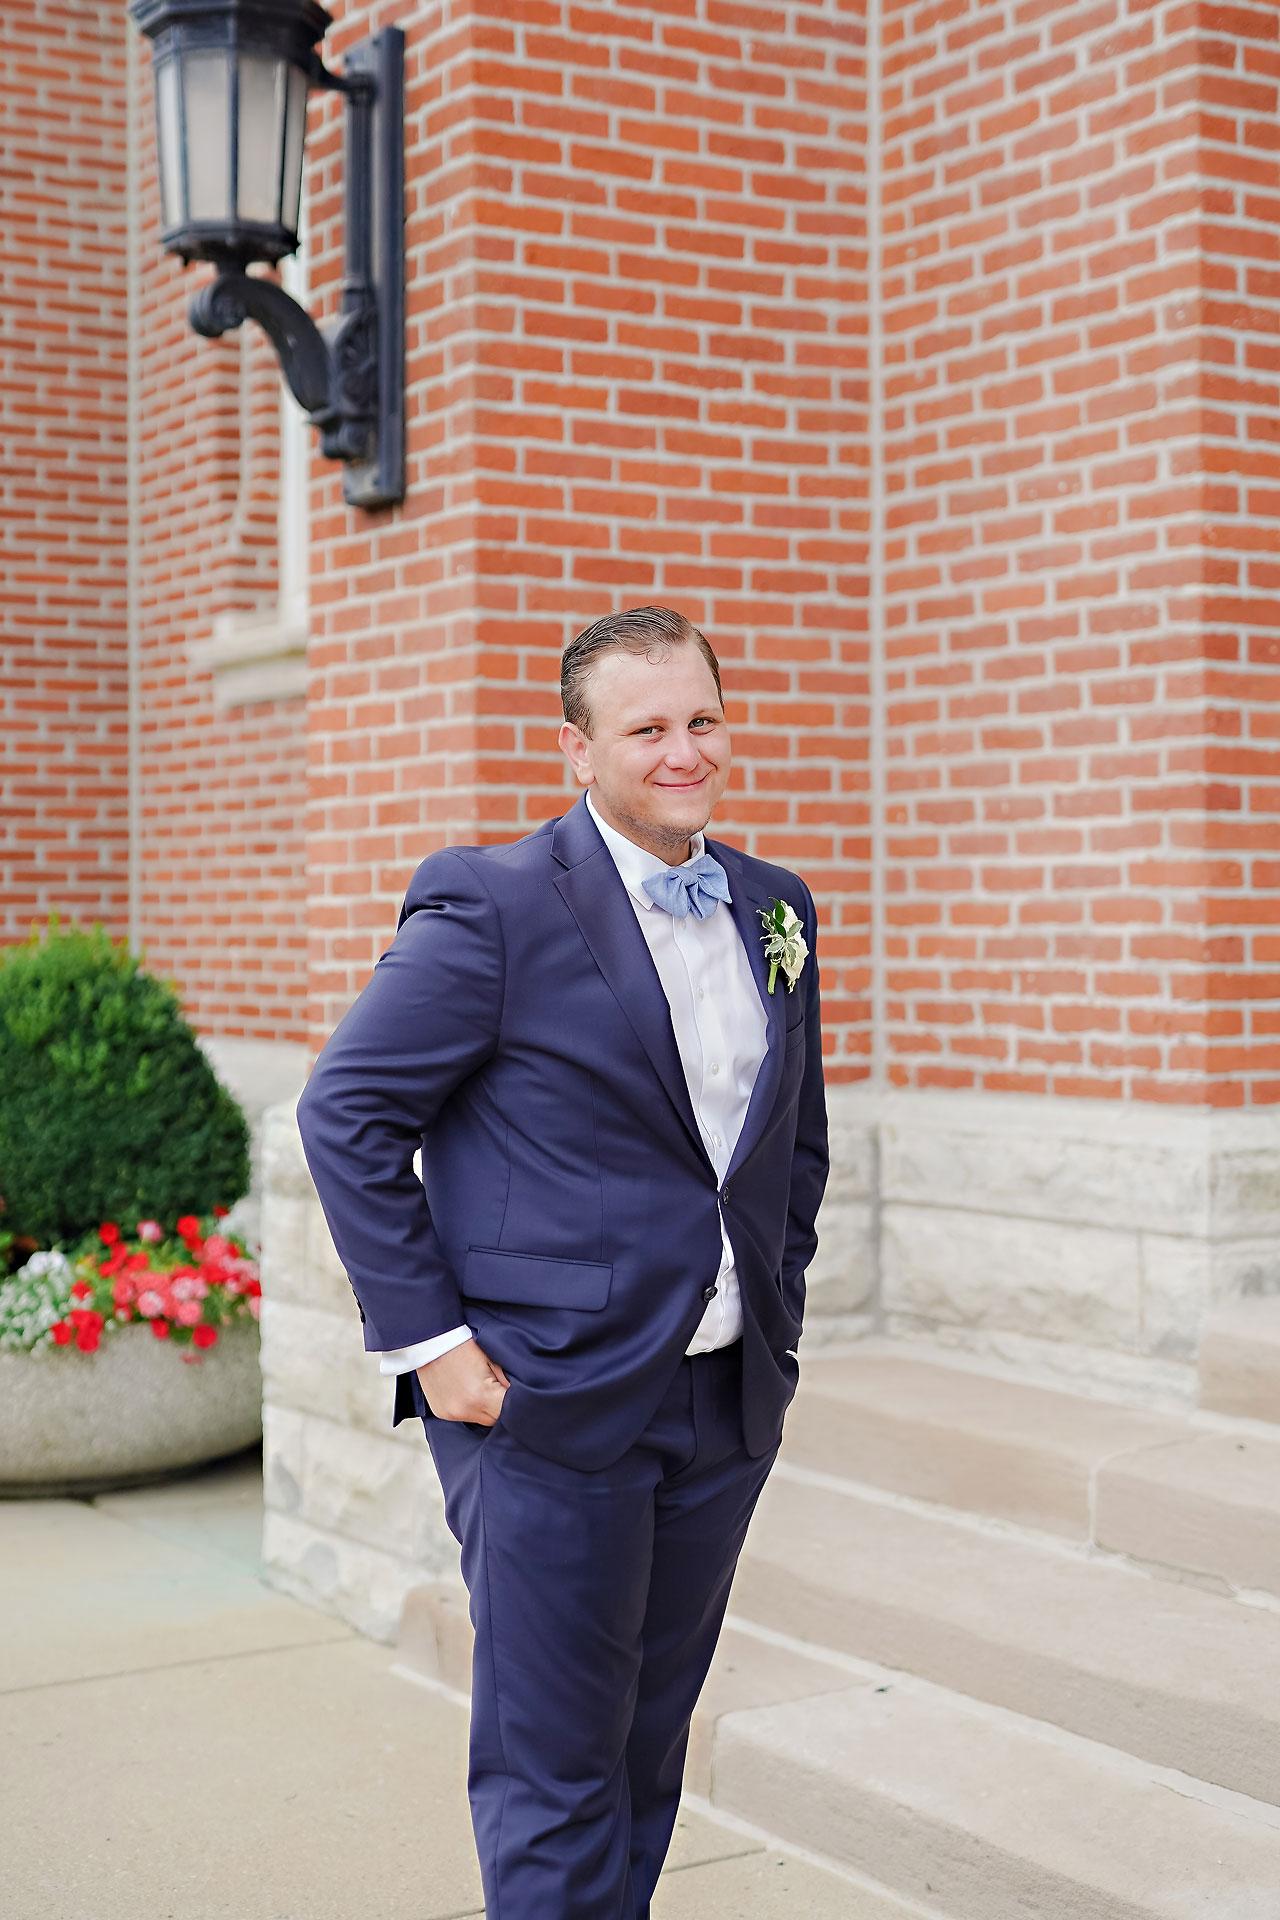 Sammi Jack Regions Tower JPS Events Indianapolis Wedding 150